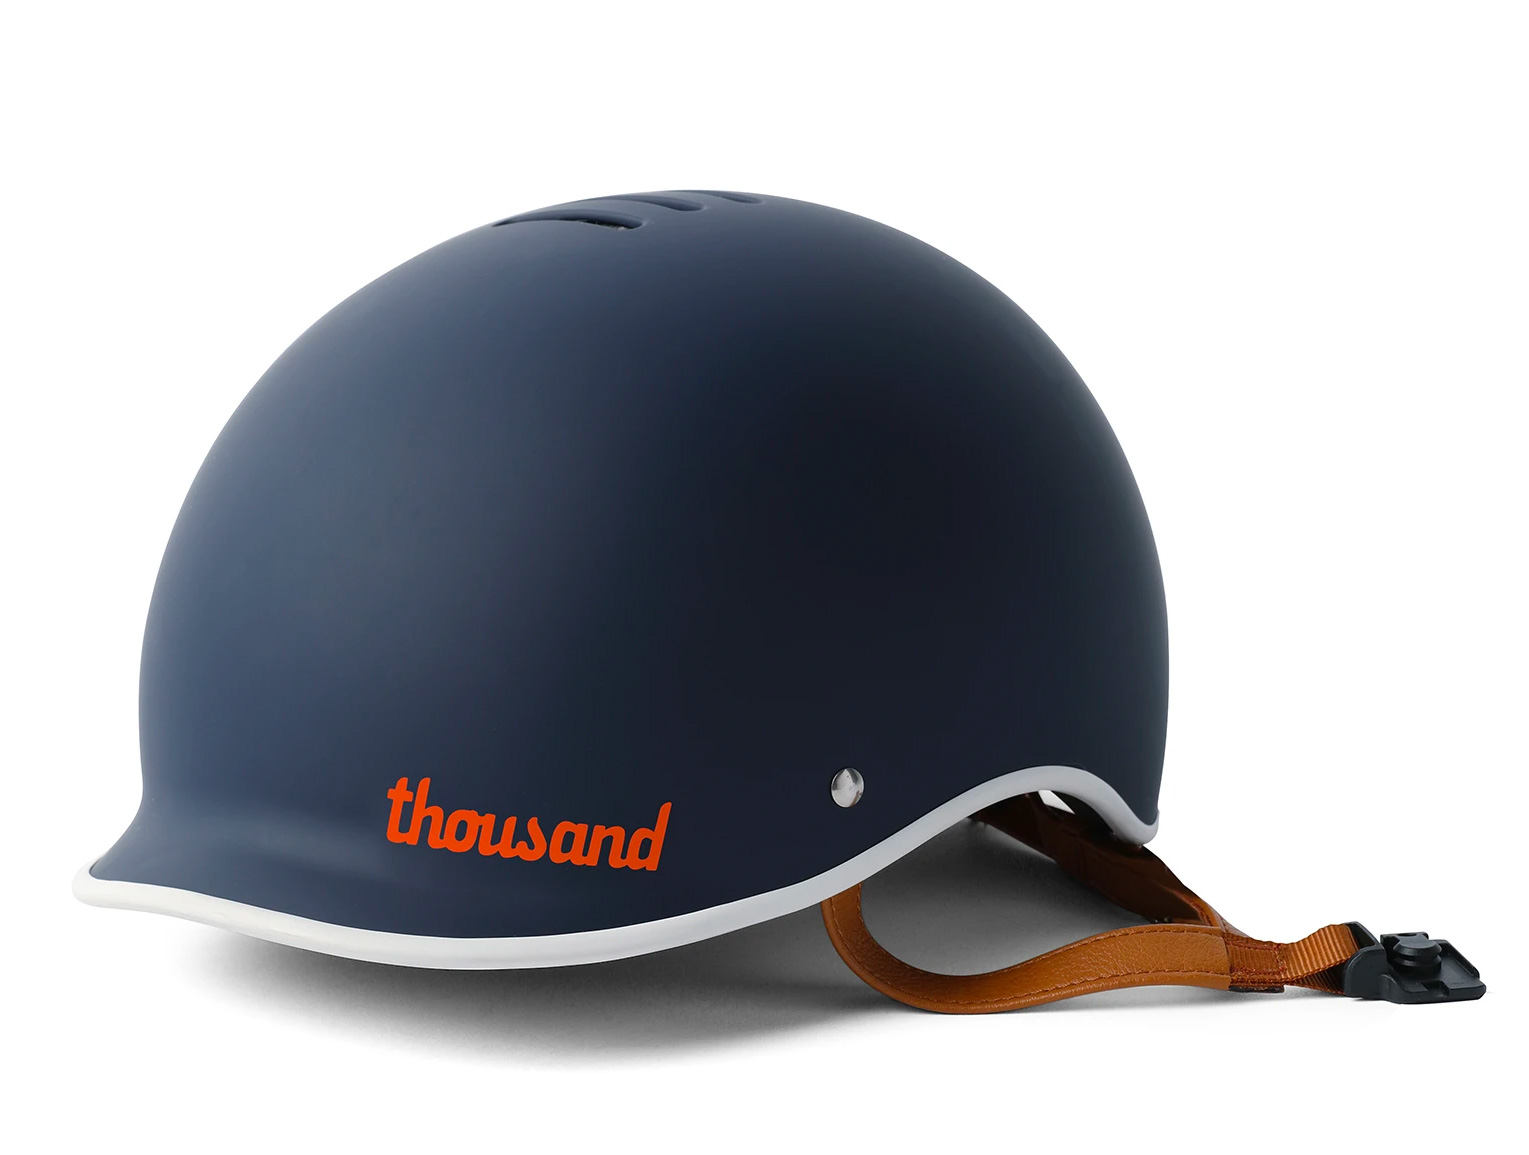 Smooth Operator: Thousand's Heritage Bike Helmet at werd.com